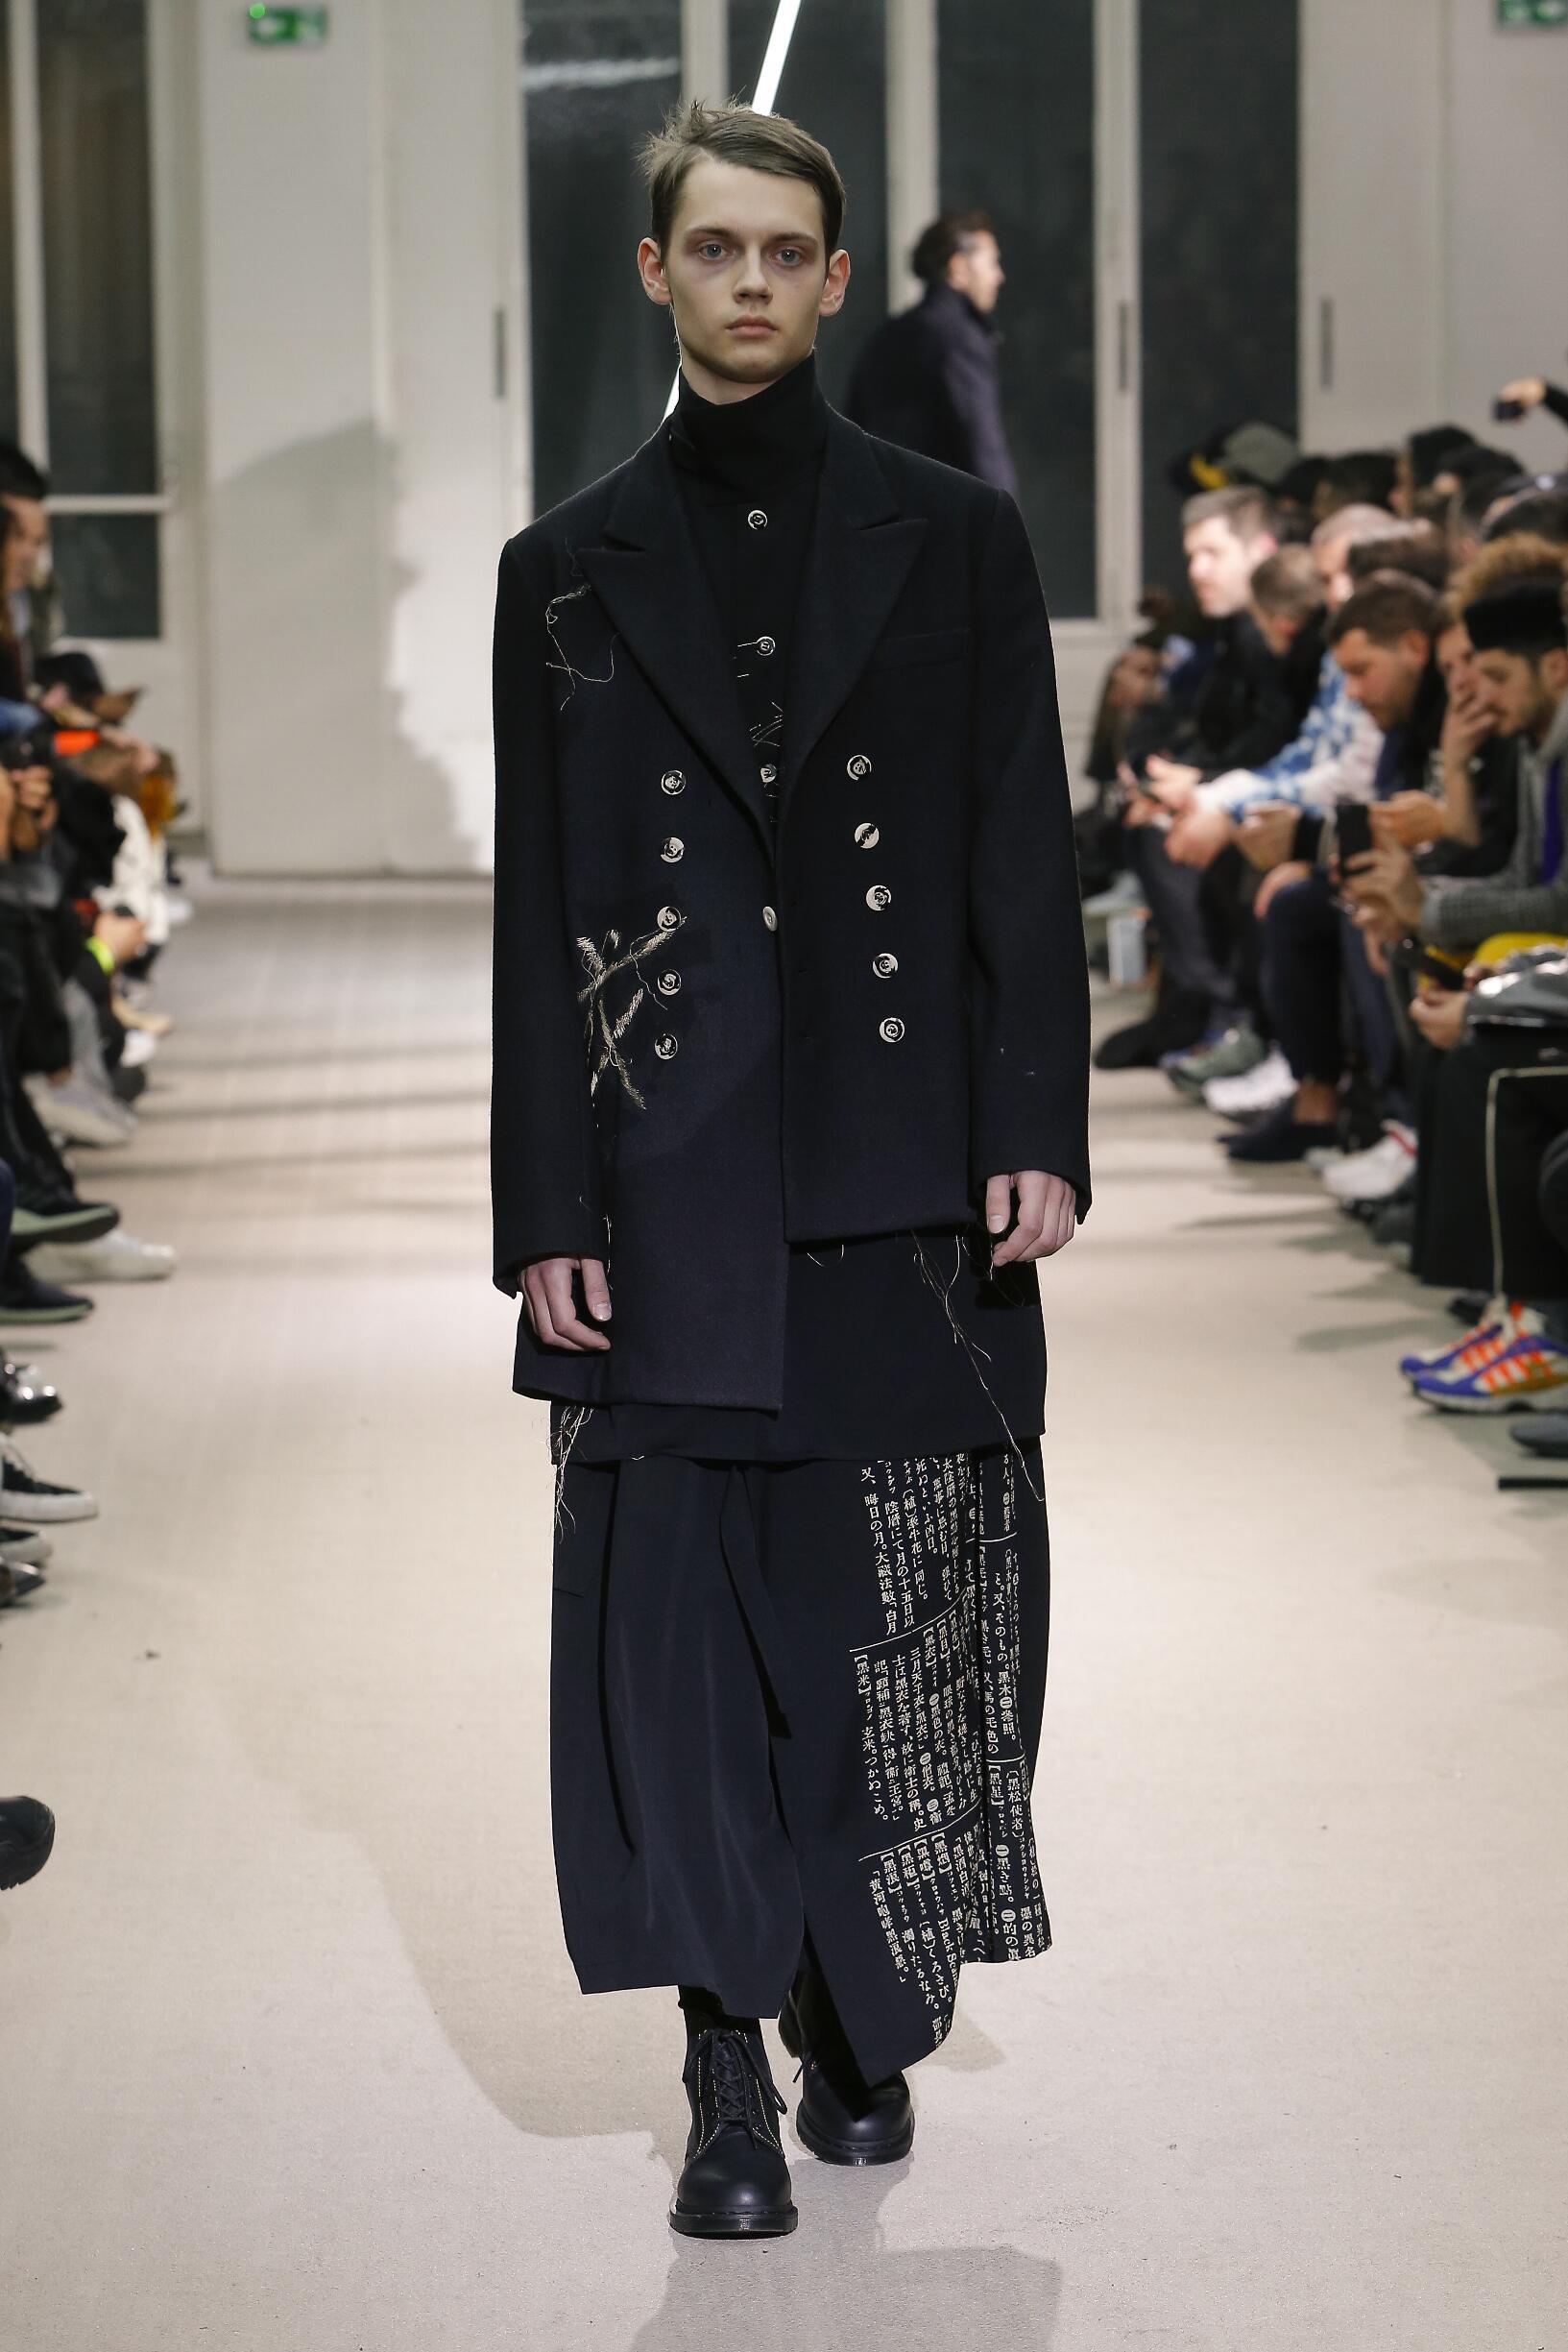 Winter 2019 Man Trends Yohji Yamamoto